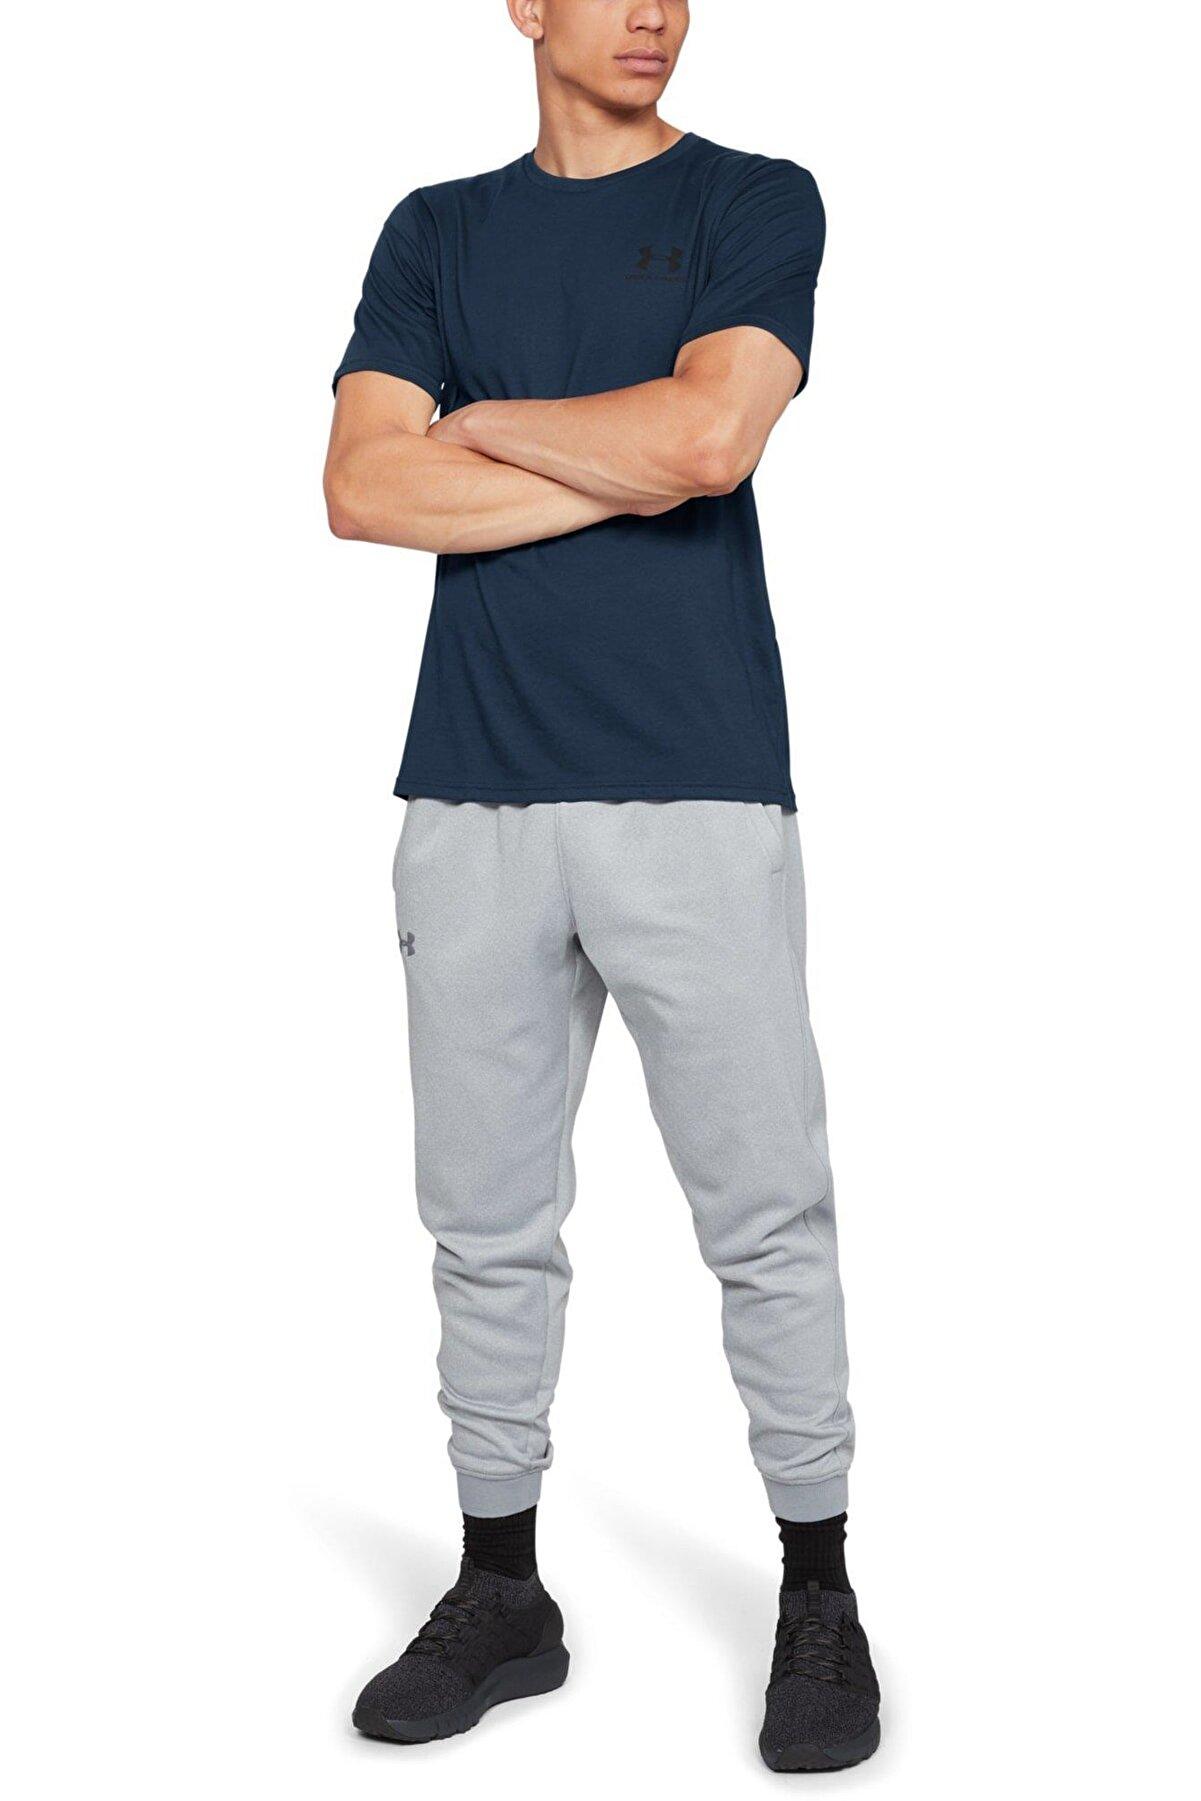 Under Armour Erkek Spor T-Shirt - SPORTSTYLE LEFT CHEST SS - 1326799-408